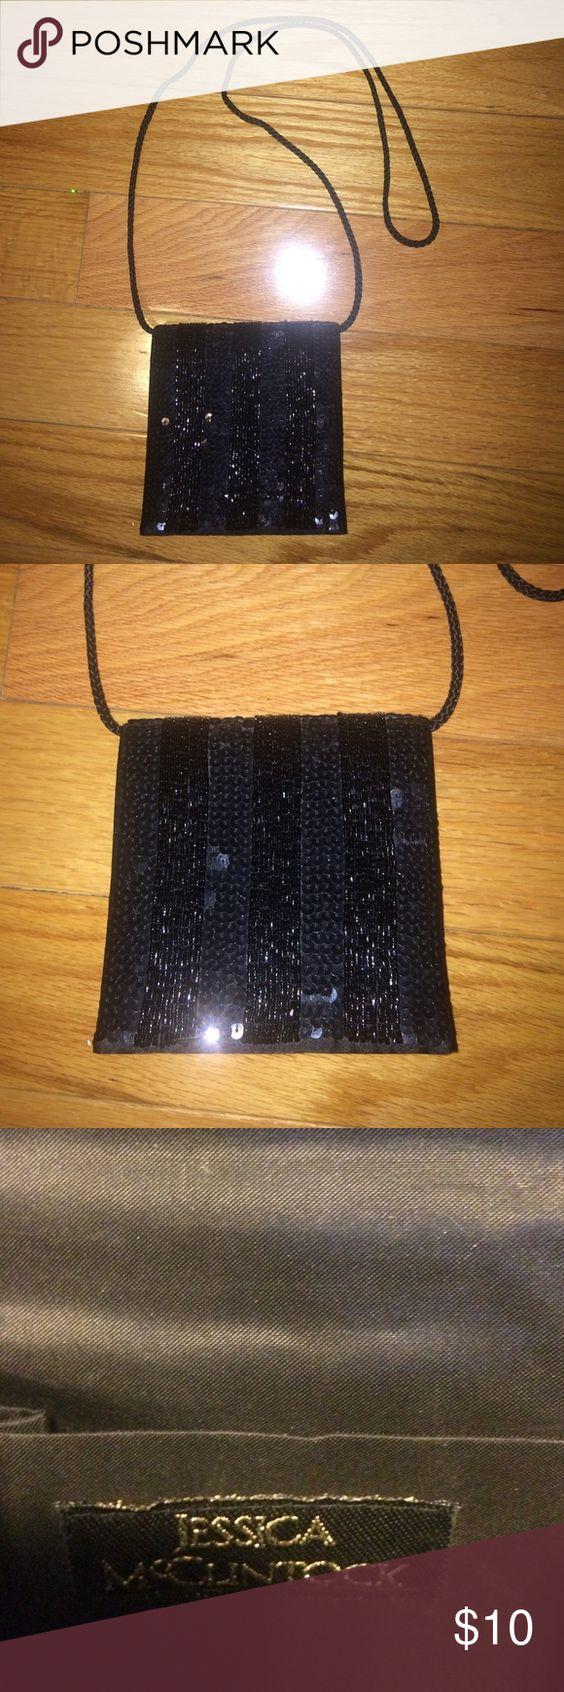 Jessica McClintock Black Sequin Evening Bag NWOT Jessica McClintock Black Sequin Evening Bag! Can carry as clutch or over the shoulder. Jessica McClintock Bags Clutches & Wristlets